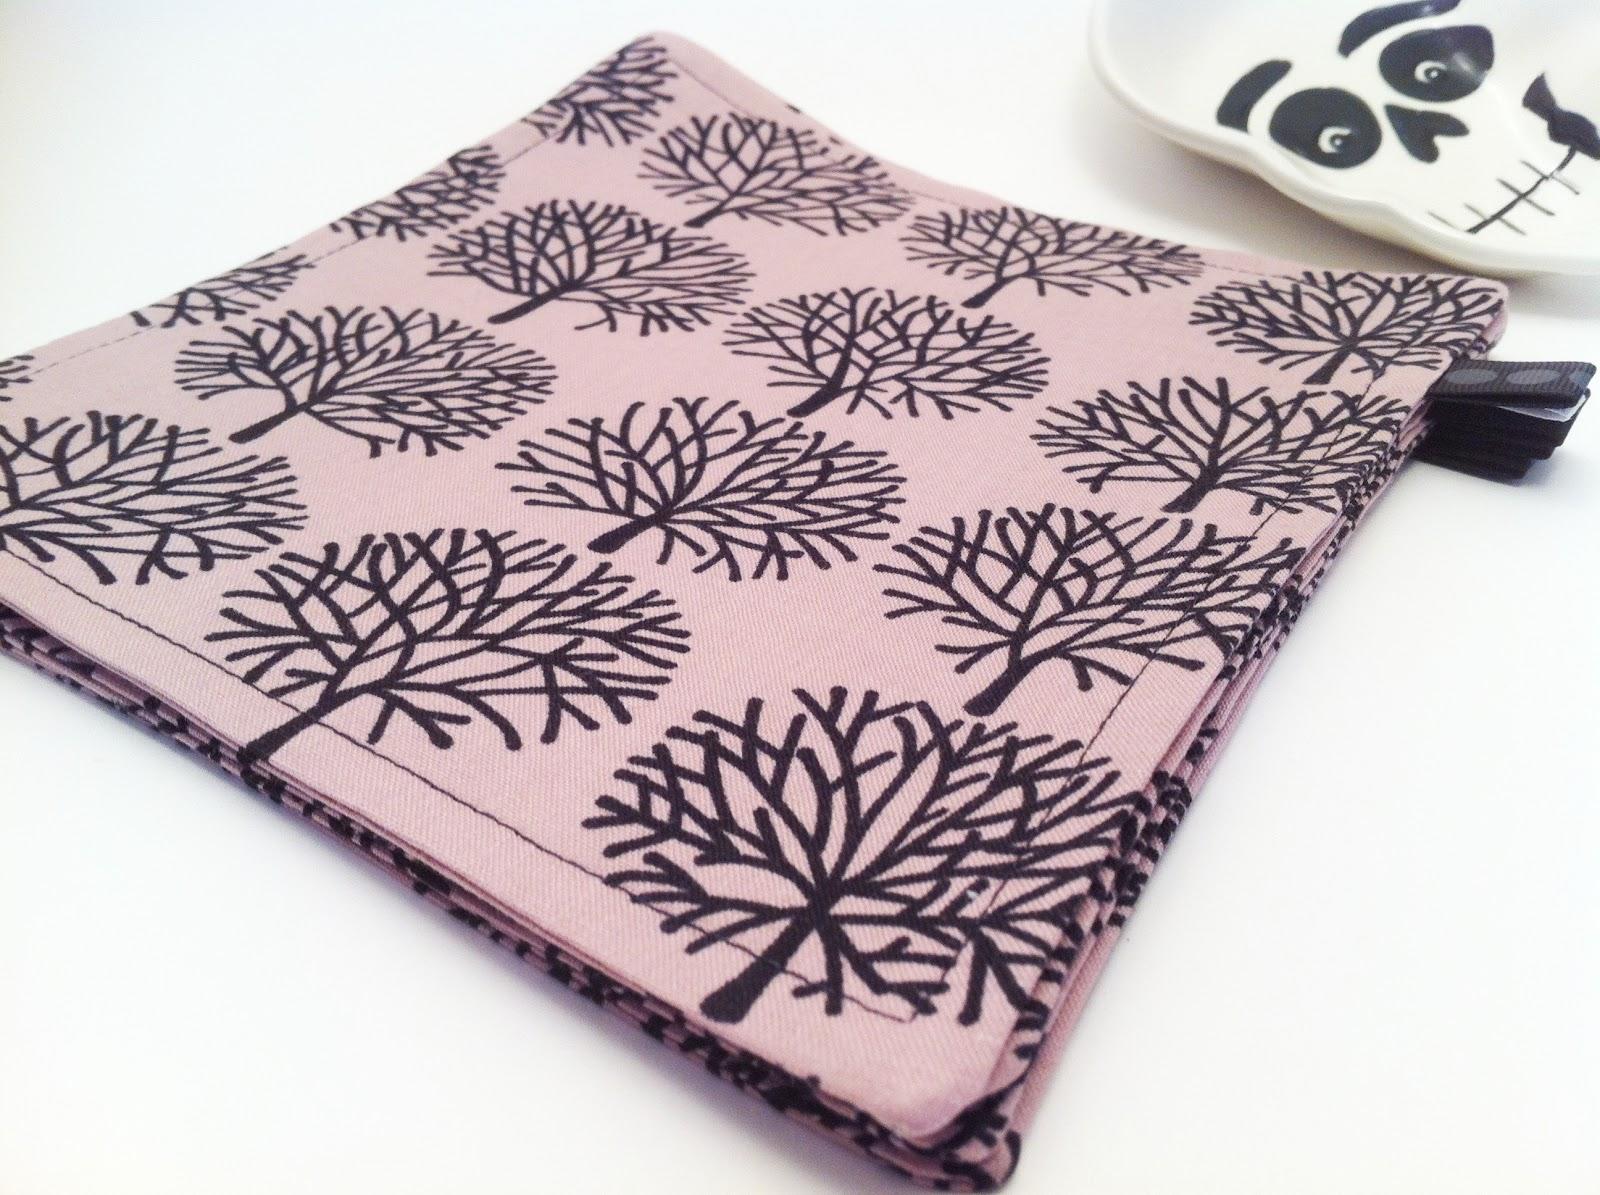 Stackd everyday napkins com halloween cloth napkins for Halloween cloth napkins